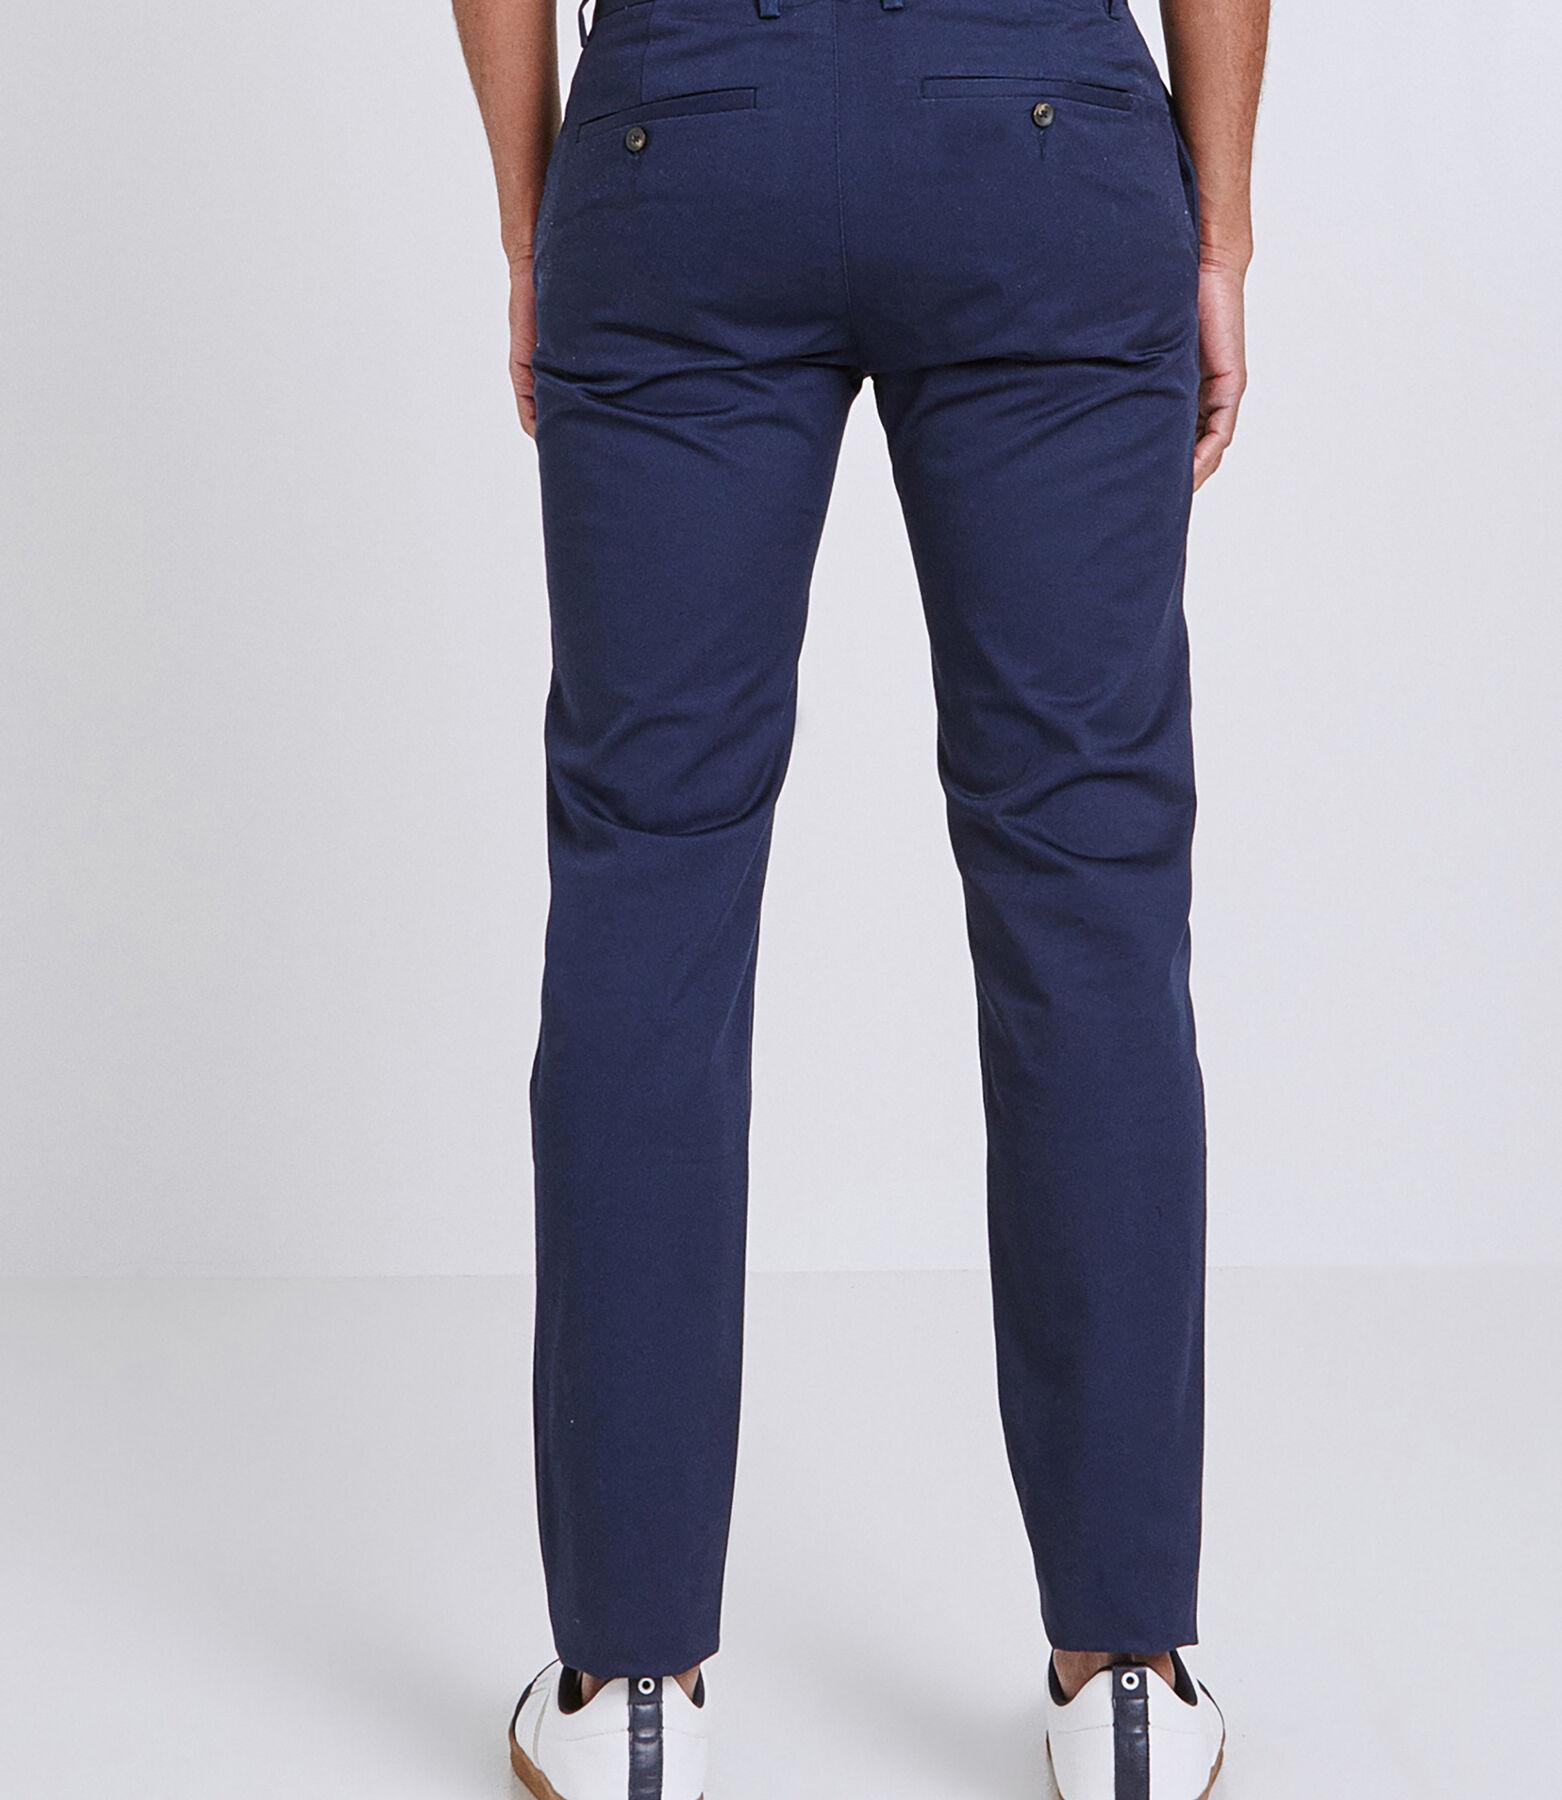 Pantalon Urbain Bleu Nuit